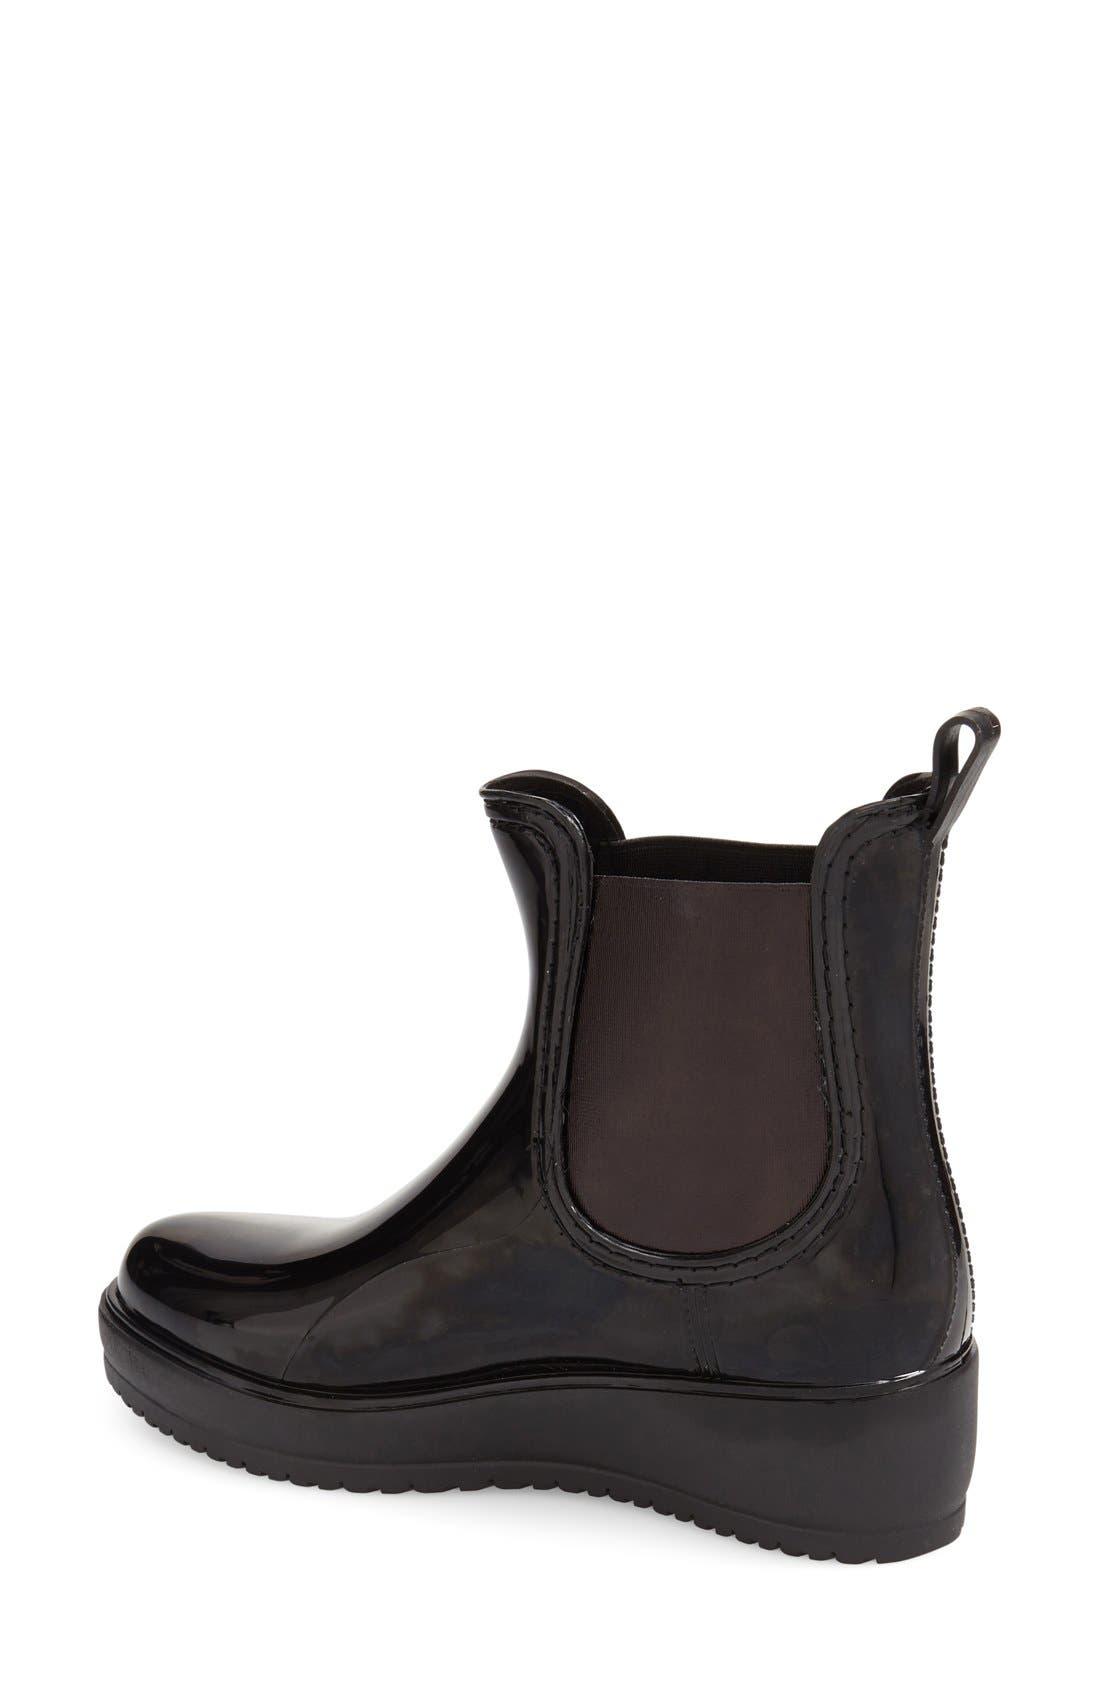 'Wakefield' Waterproof Platform Rain Chelsea Boot,                             Alternate thumbnail 4, color,                             BLACK